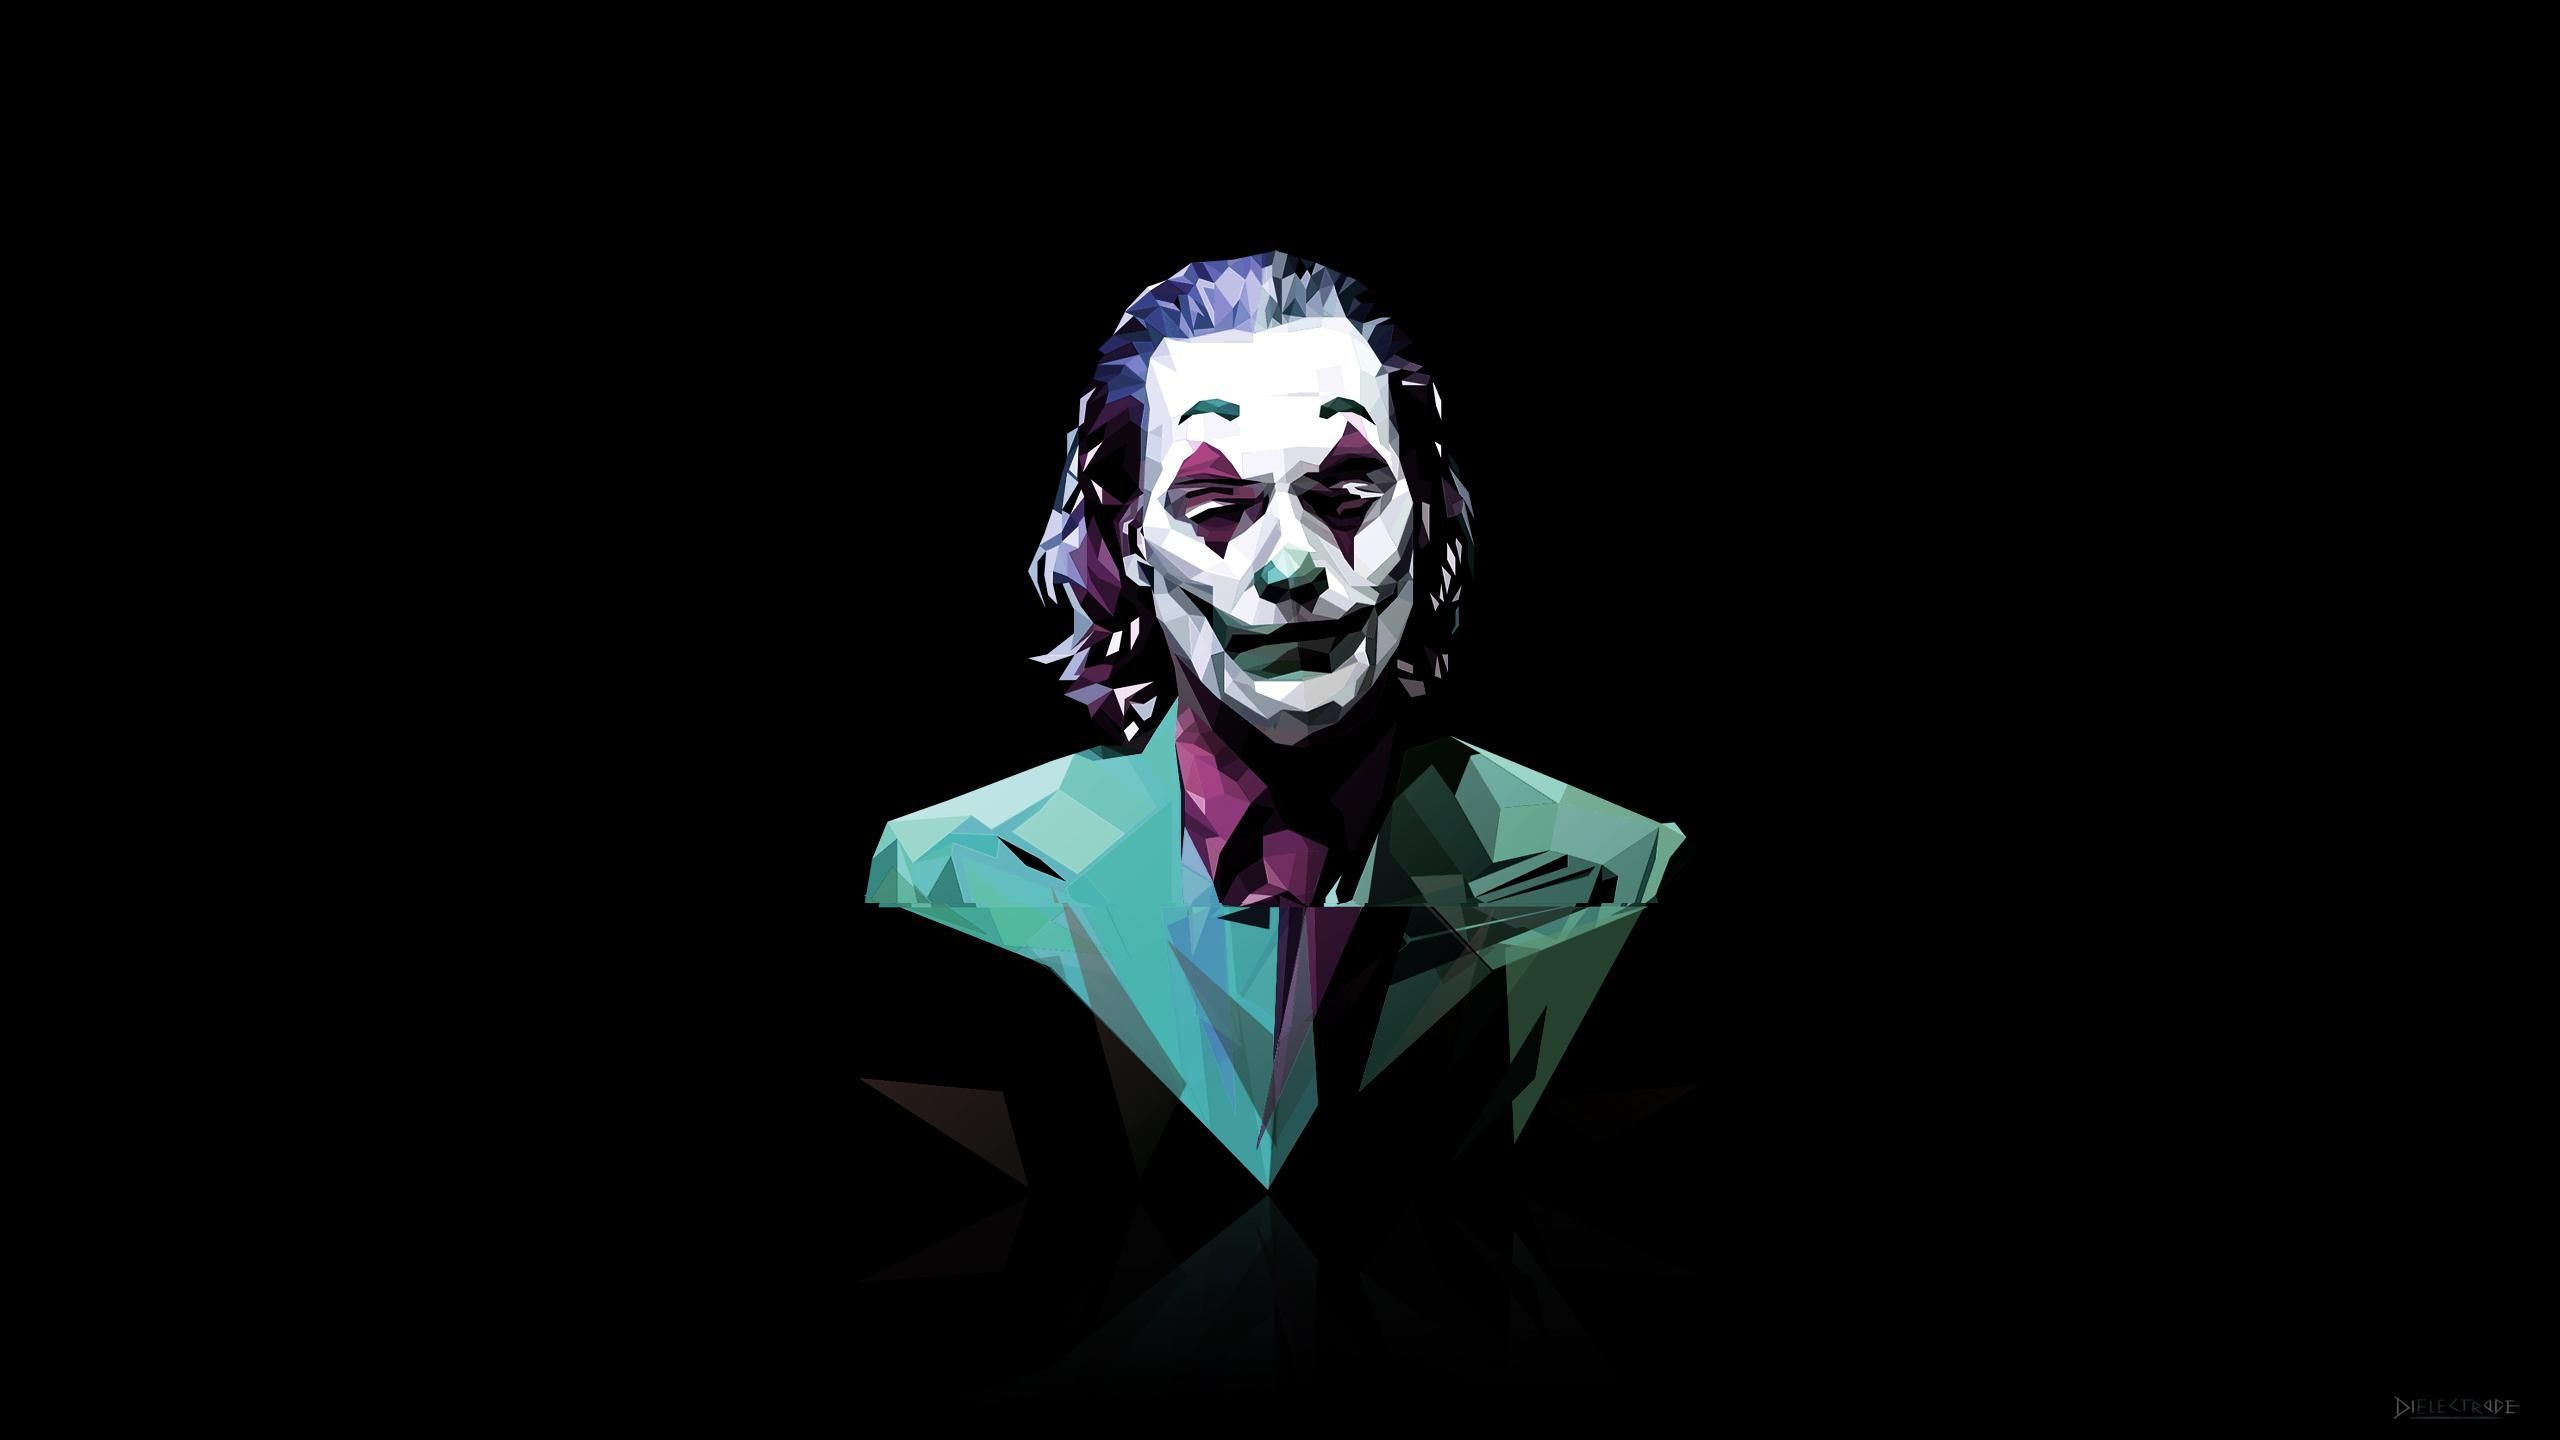 Joker Hd Wallpaper Joker Wallpapers Joker Iphone Wallpaper Joker Wallpaper